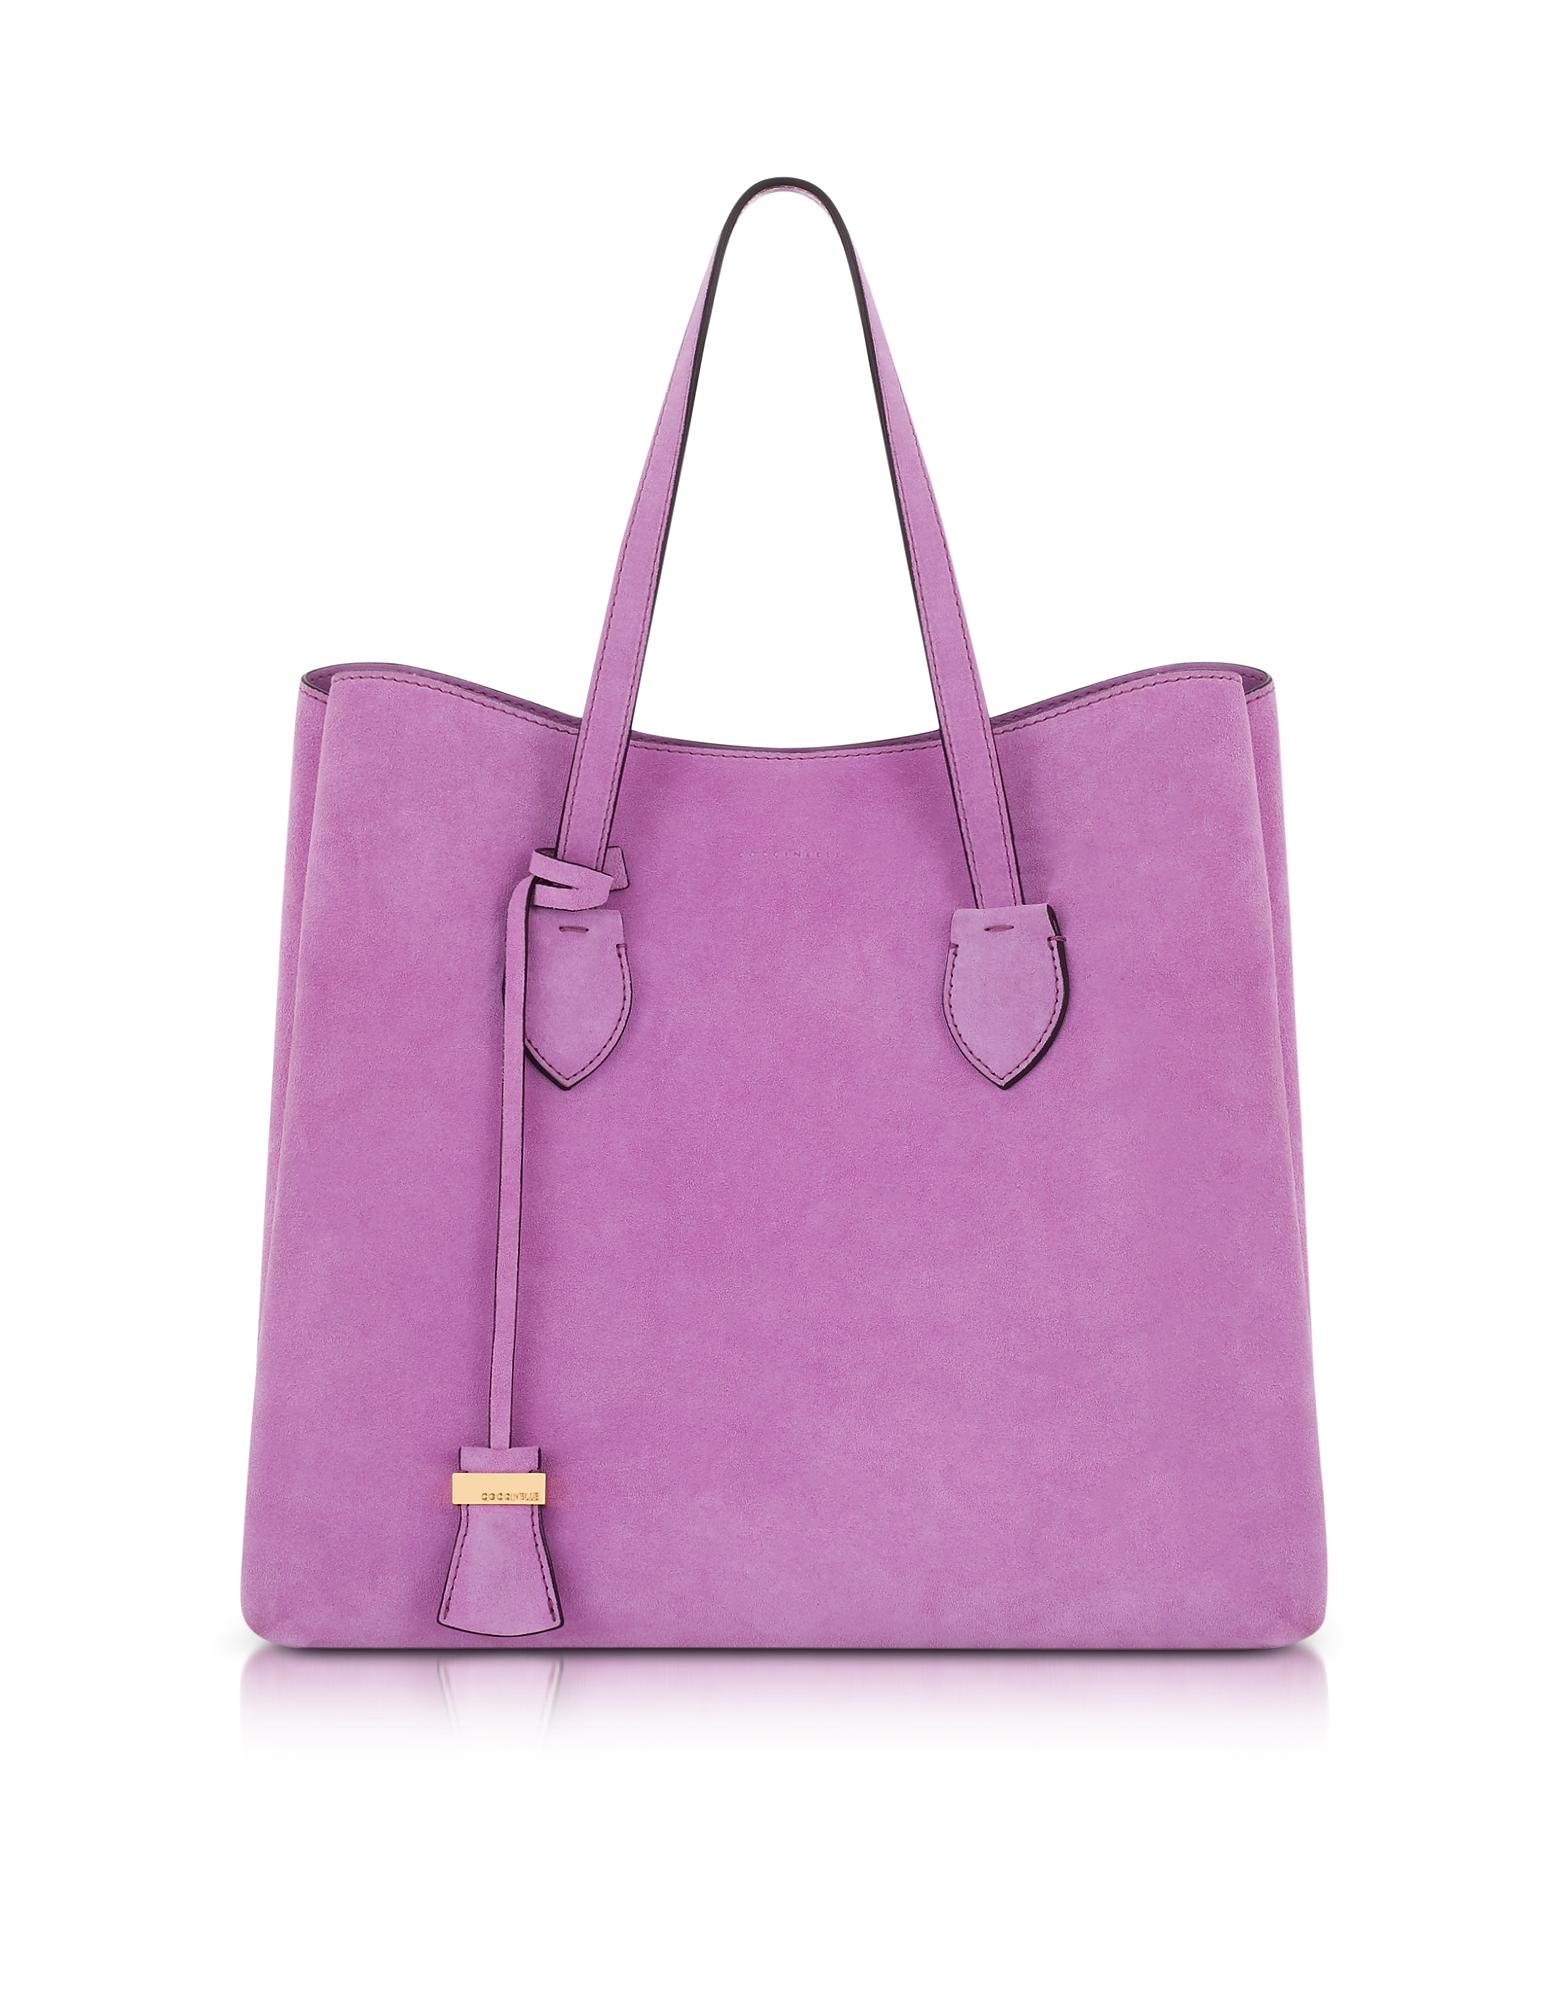 Coccinelle Handbags, Celene Orchid Suede Tote Bag